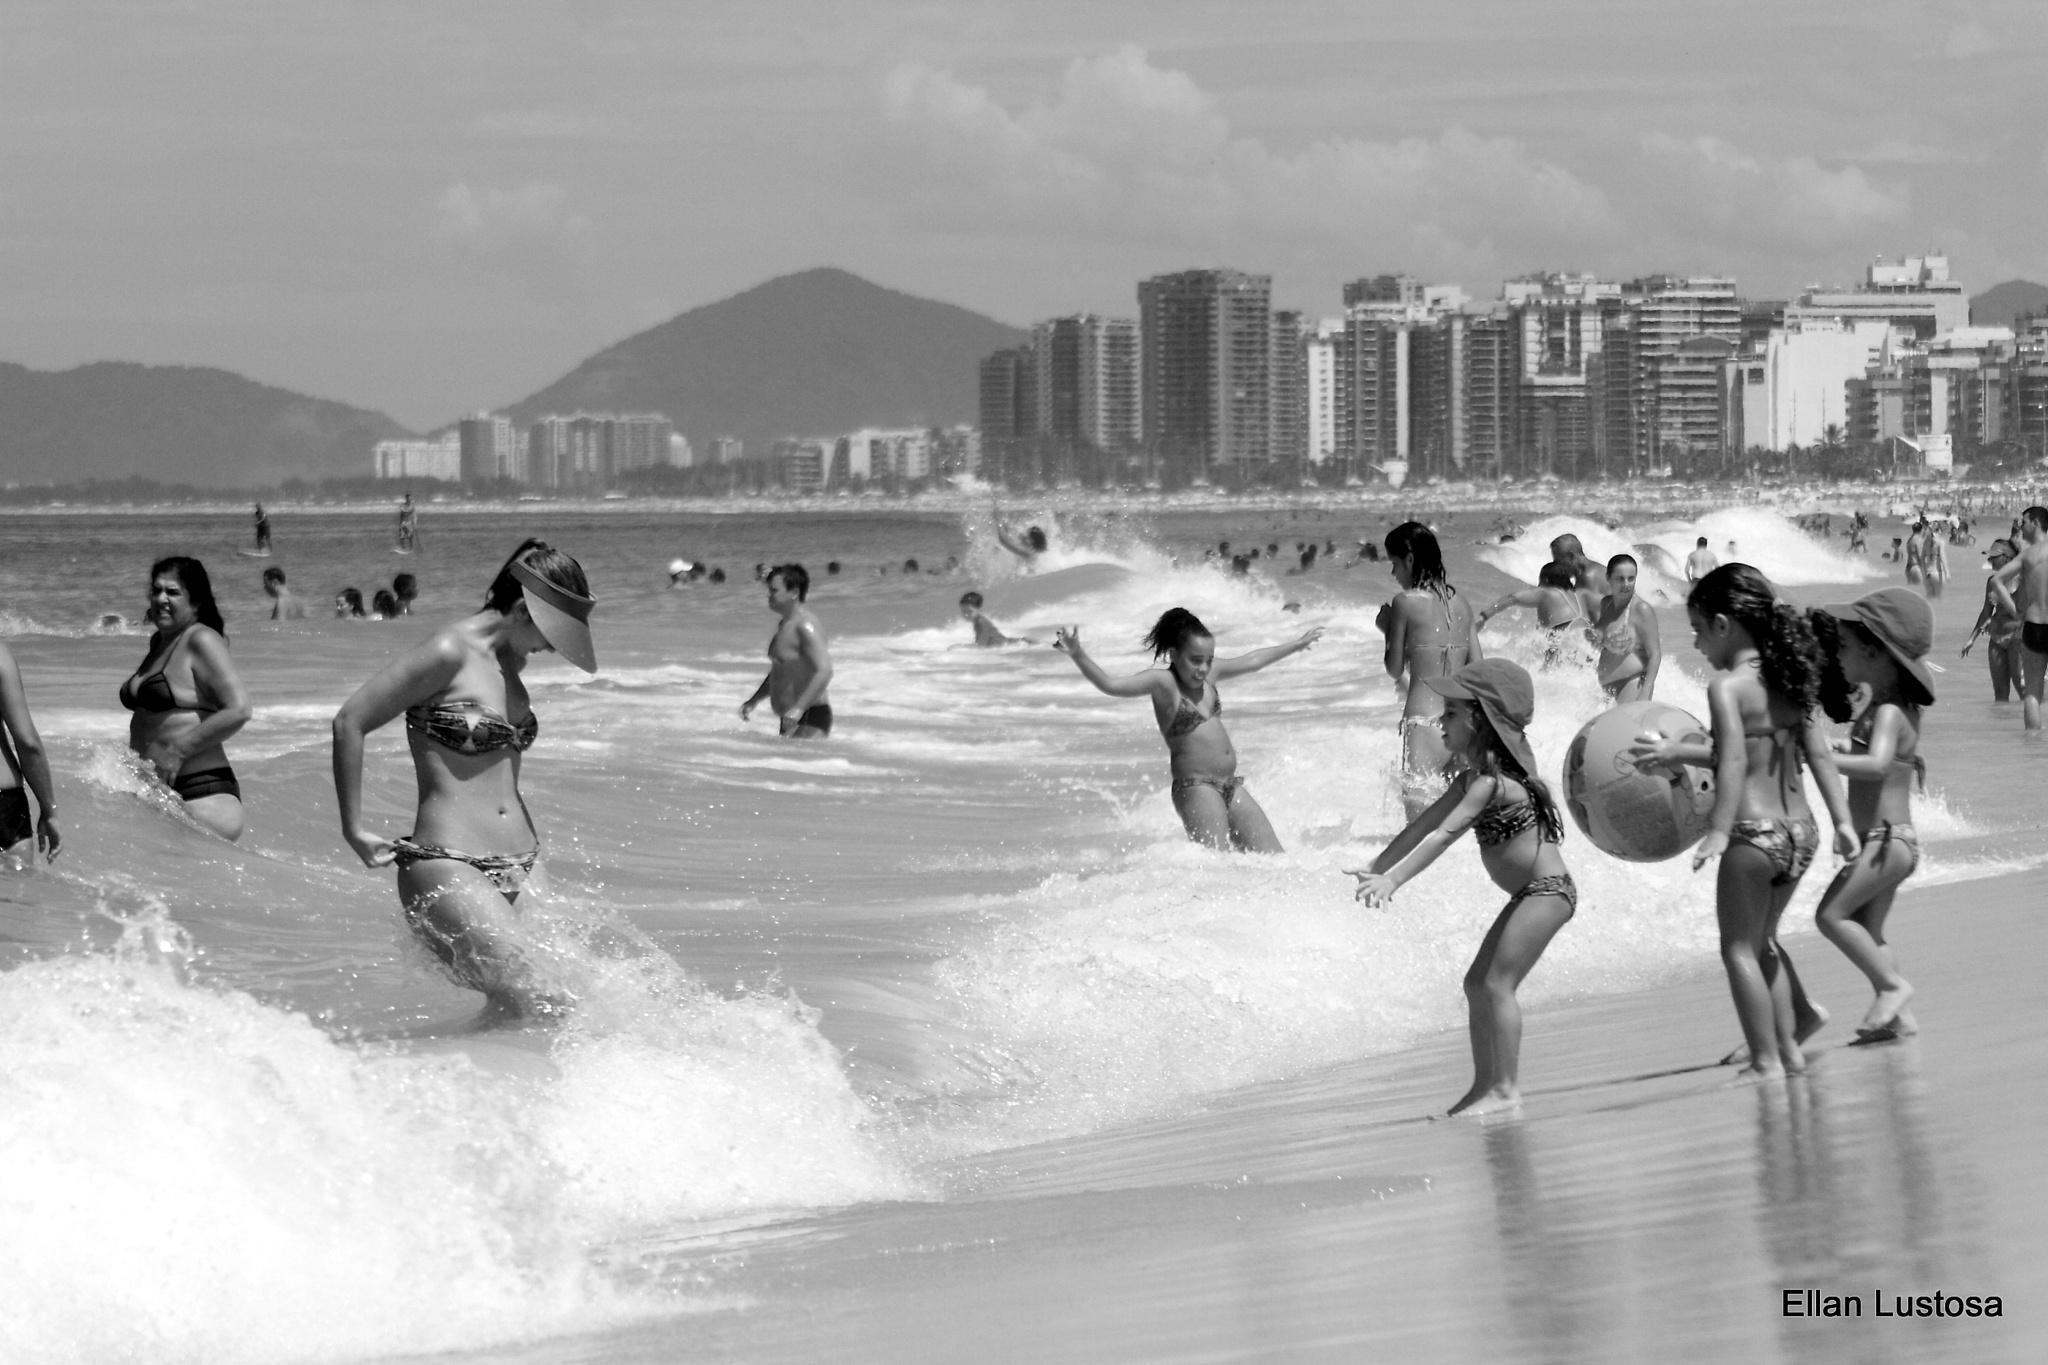 BARRA DA TIJUCA BEACH by Ellan Lustosa Photojournalist